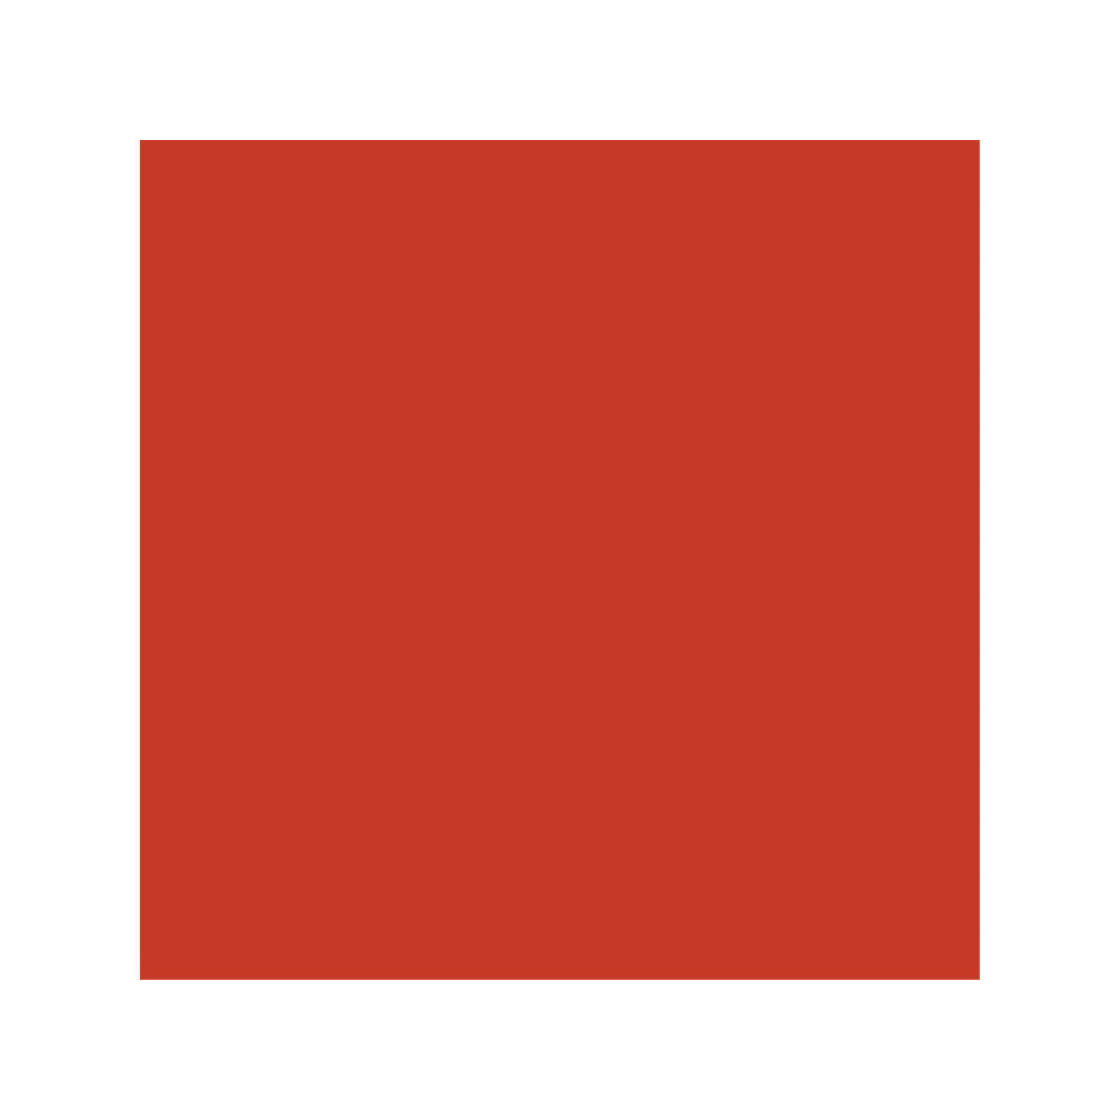 Linde Stapler Rot Kunstharzlack Asinol 1 000 Ml Wamo Technik Shop 12 35